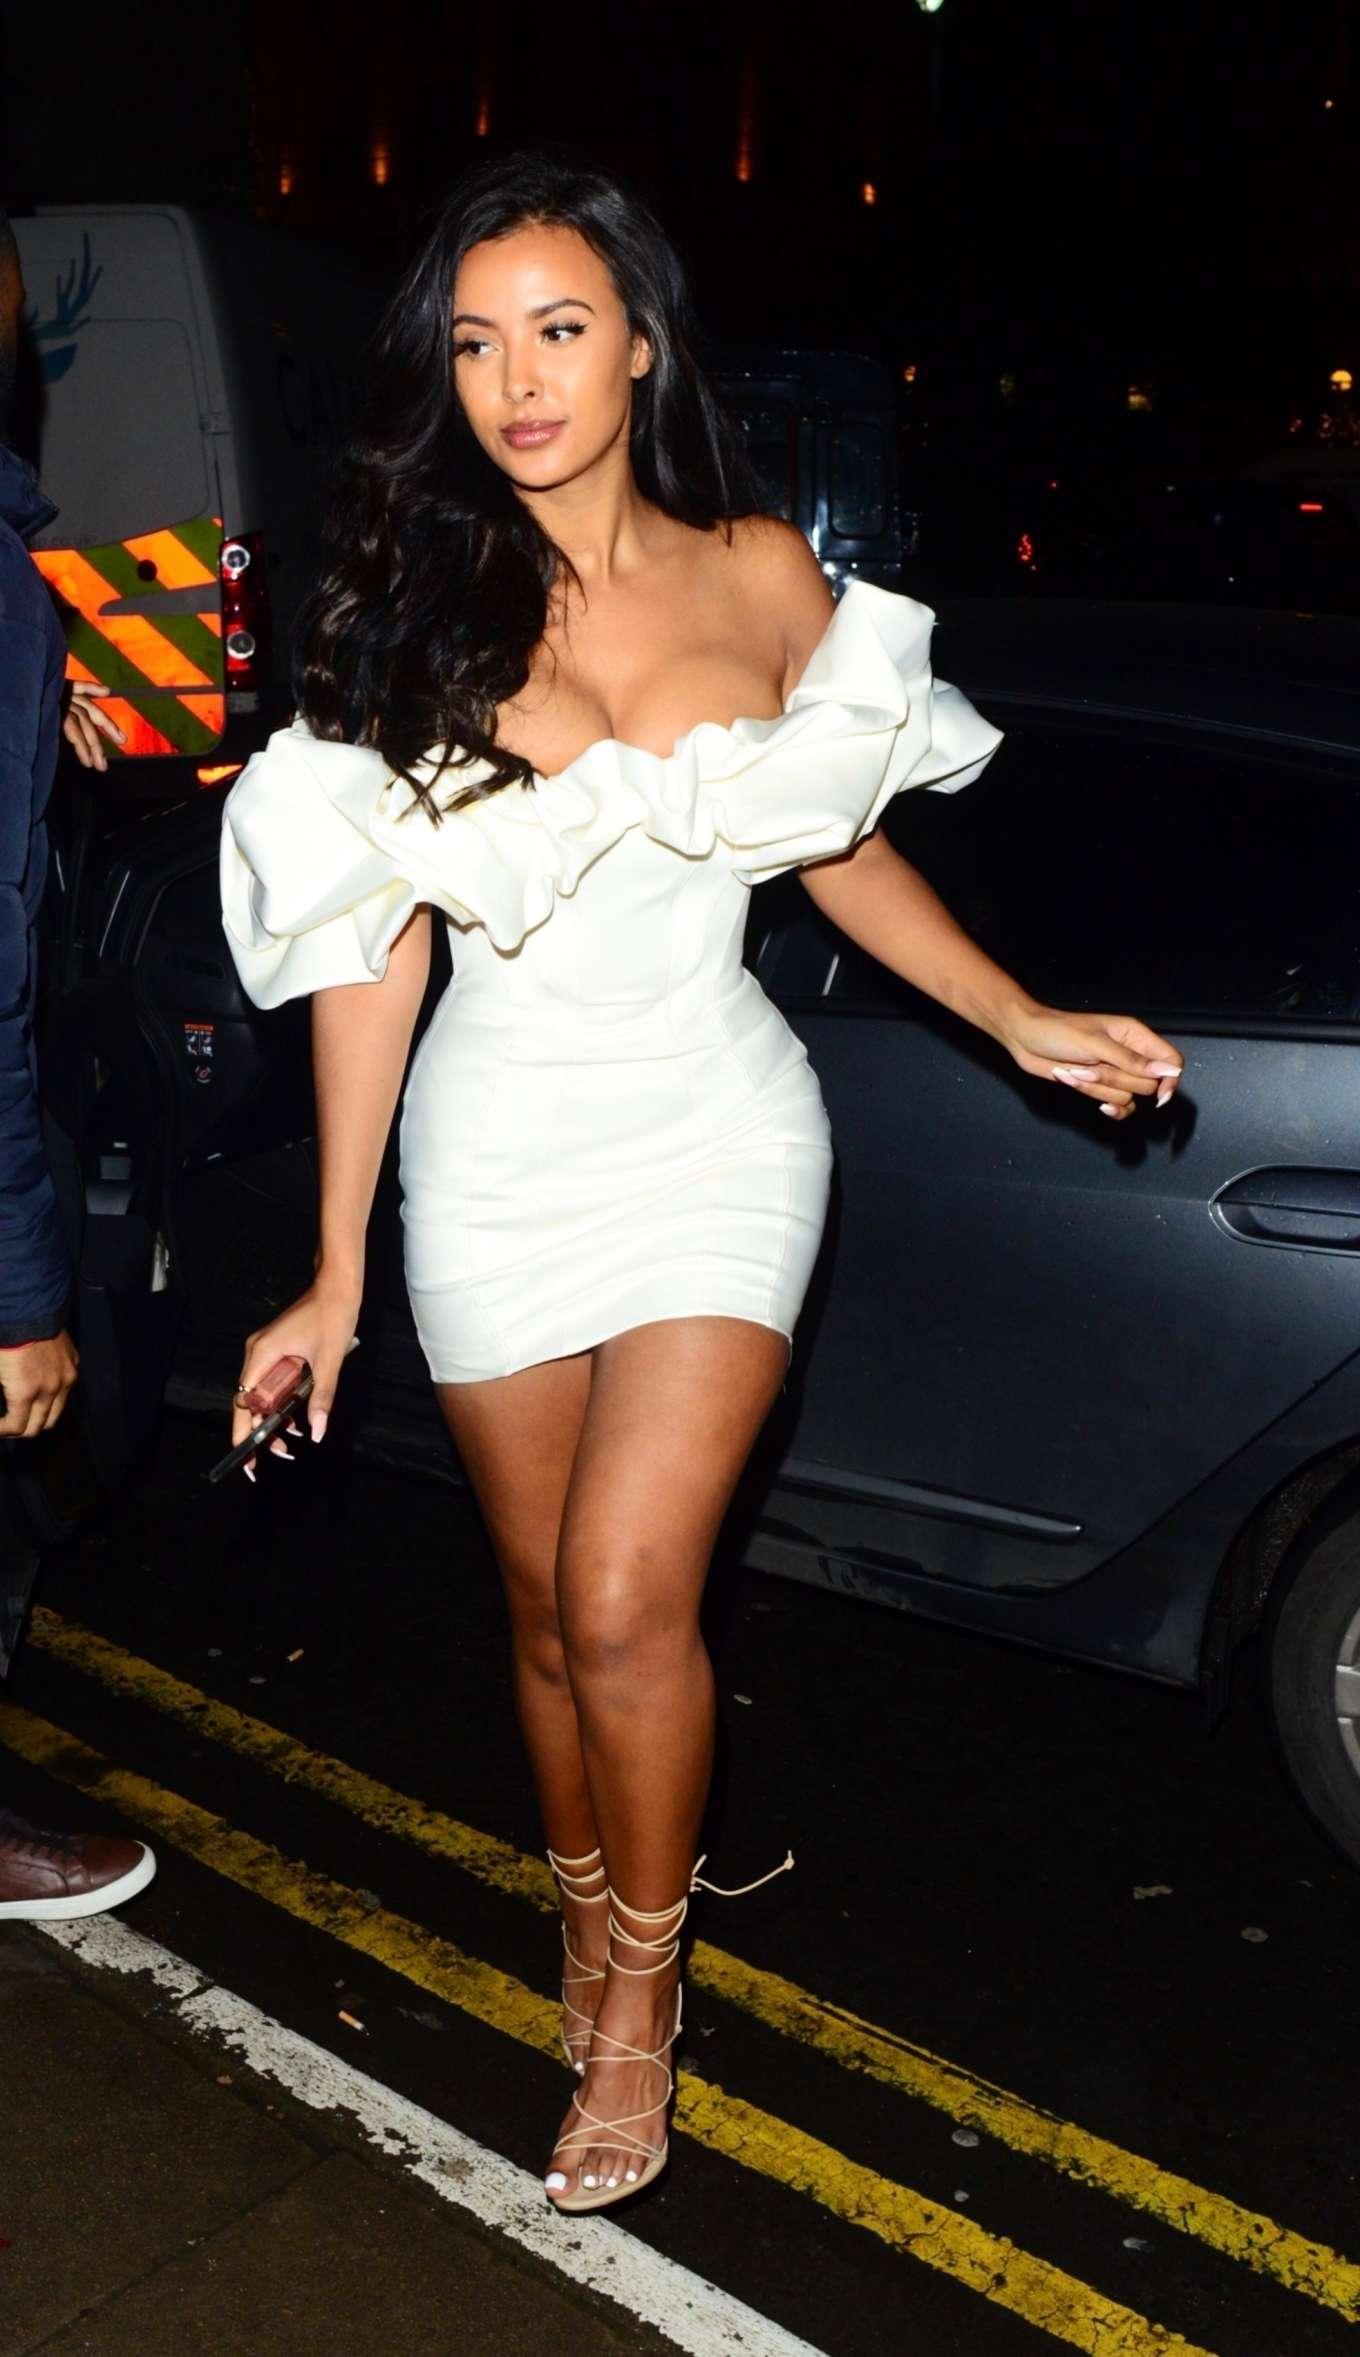 Maya Jama 2019 : Maya Jama in White Mini Dress – Out and about in London-05